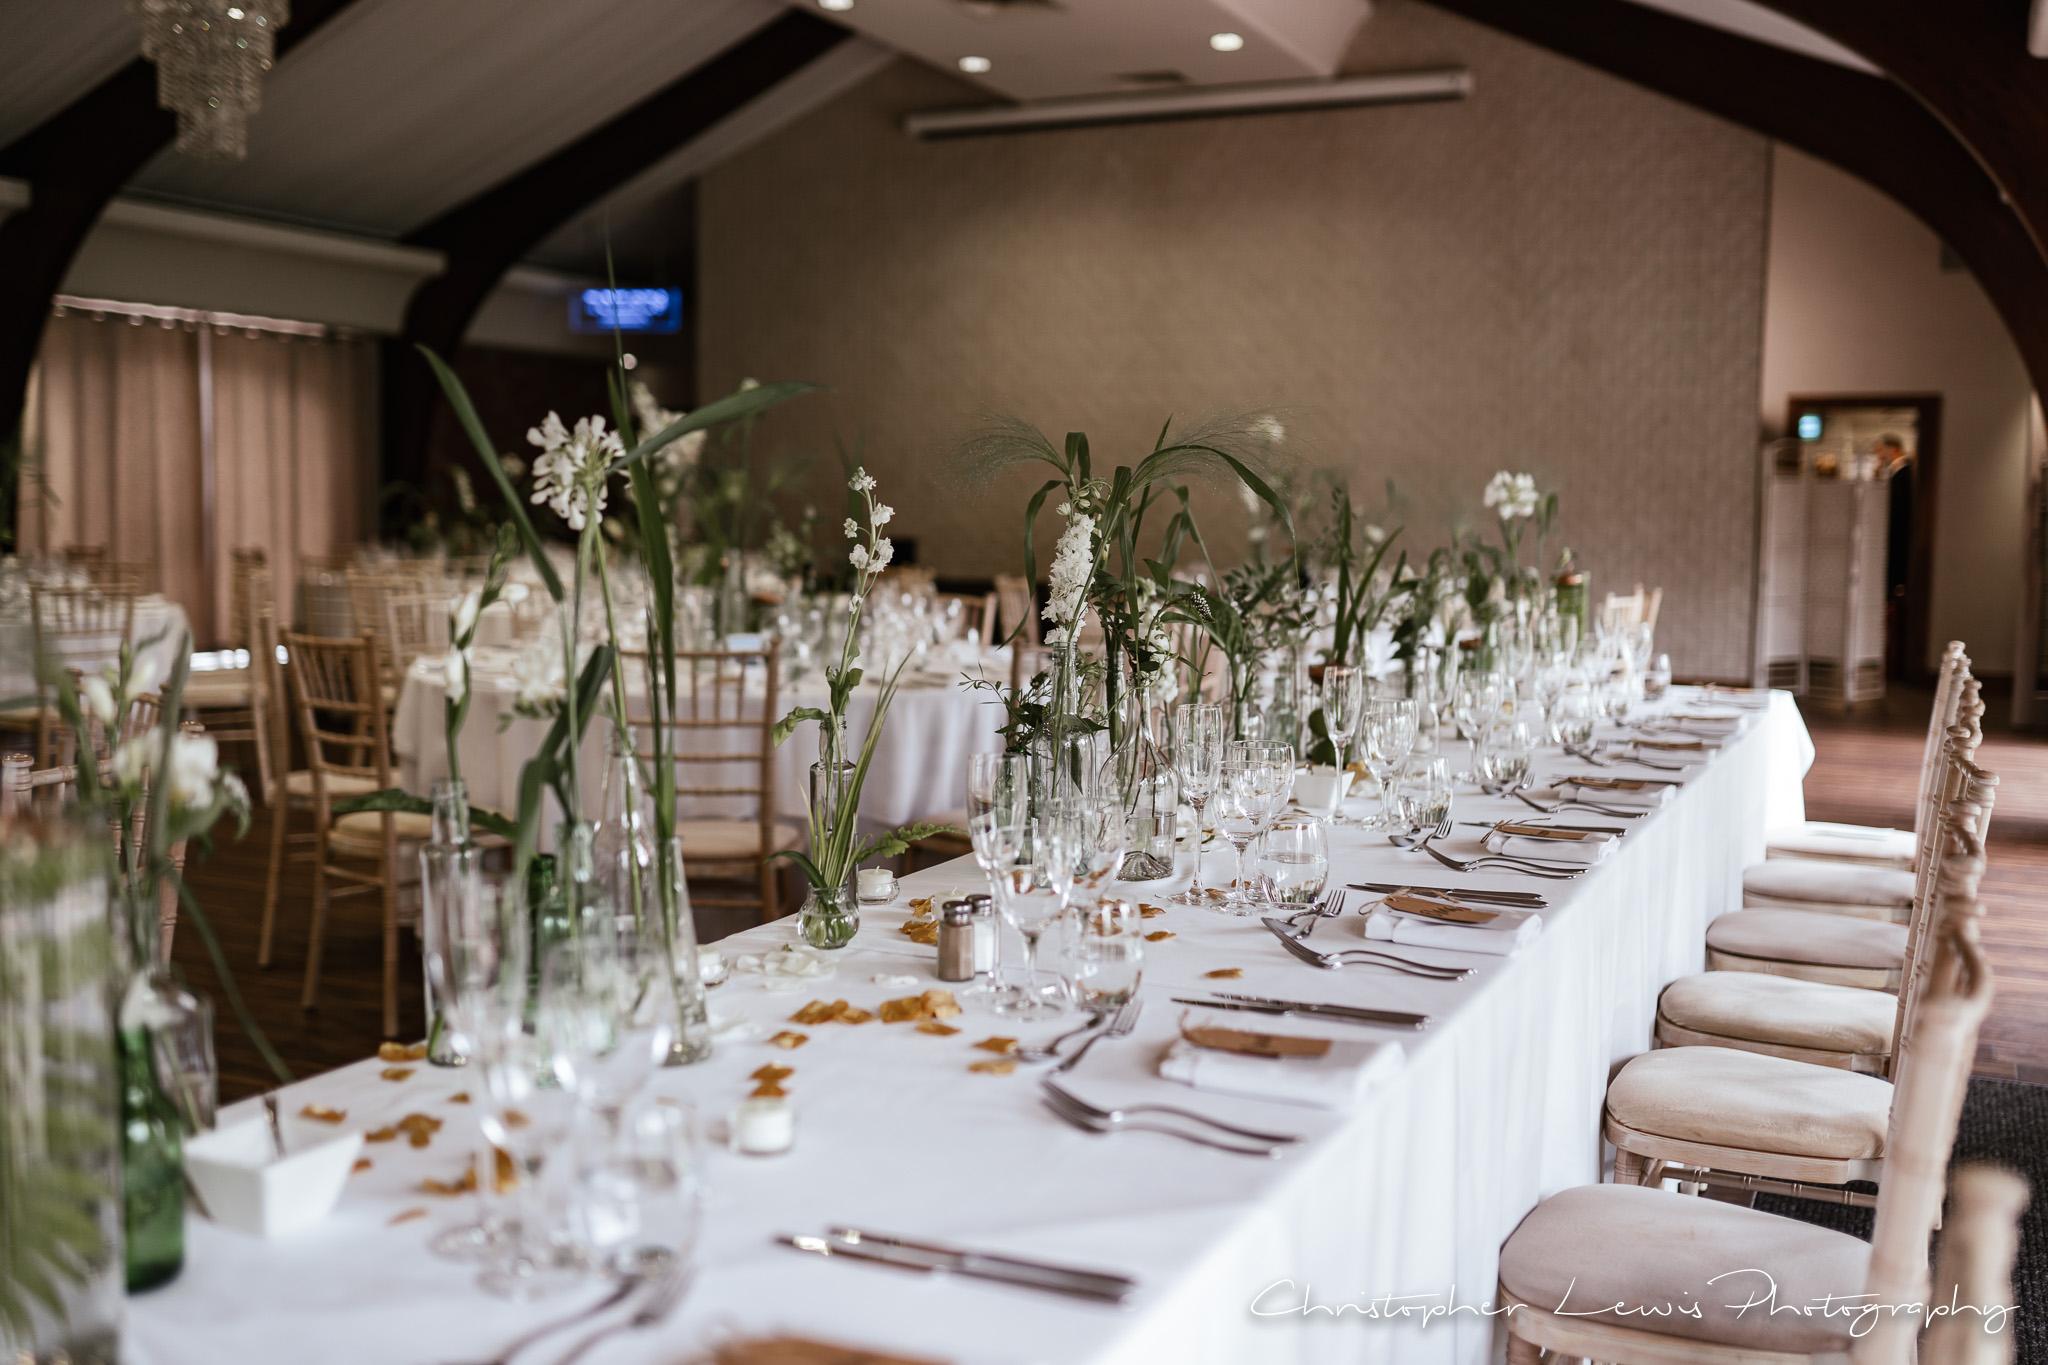 Colshaw Hall Wedding decor